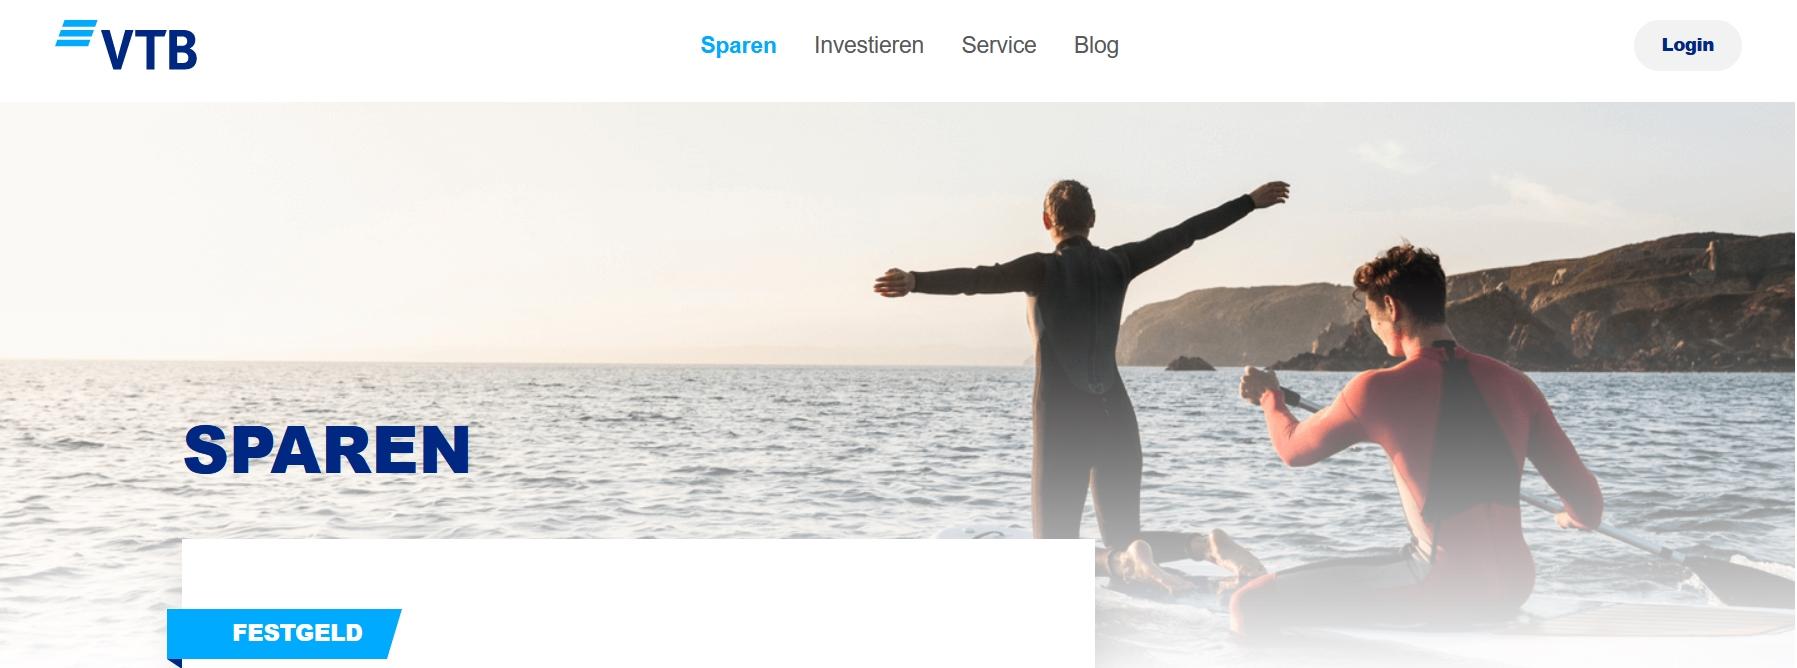 VTB Direktbank Festgeldkonto